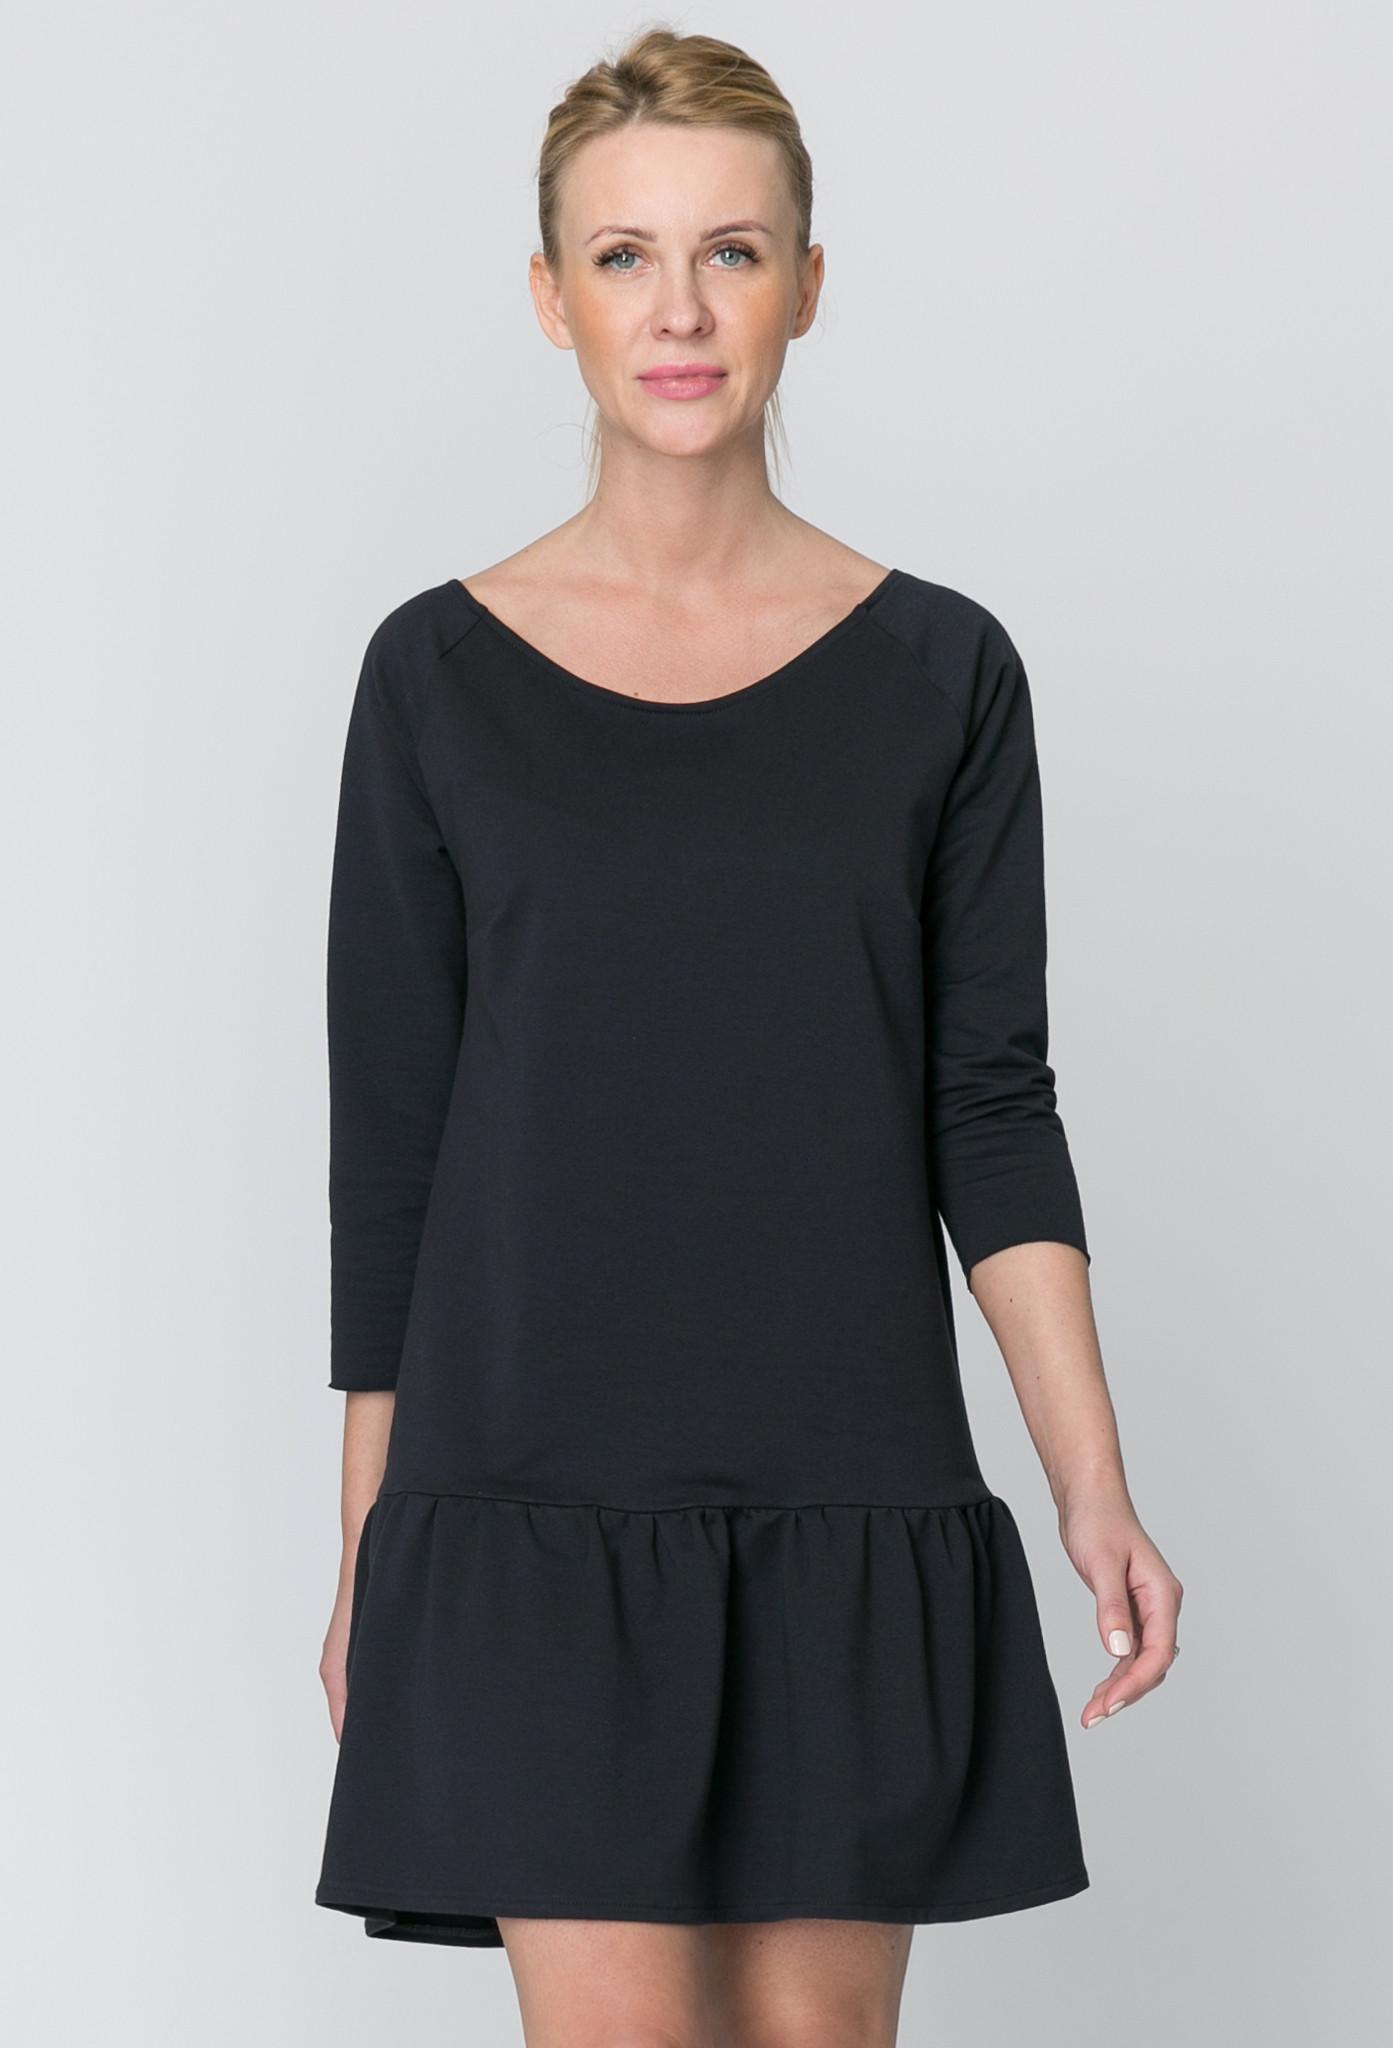 Sukienka z Falbanką Graphite WOMAN  polski projektant - The Same